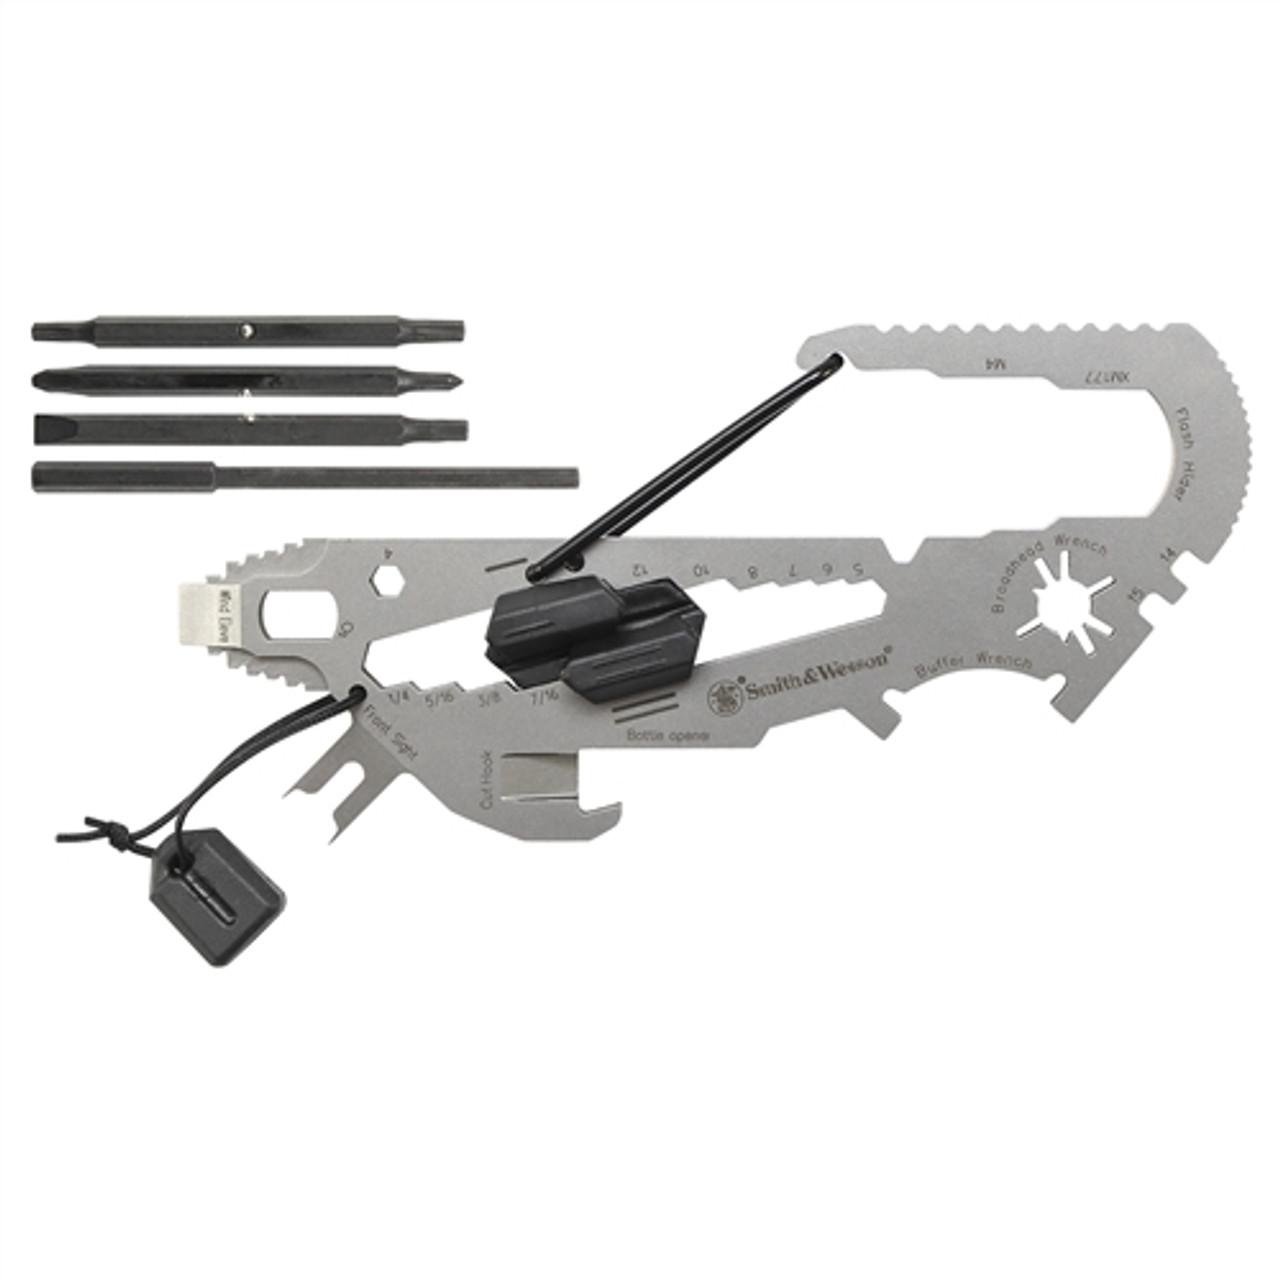 Smith & Wesson SWRT1 Rifle/Shotgun/Archery Multi-Tool, 18 Tools